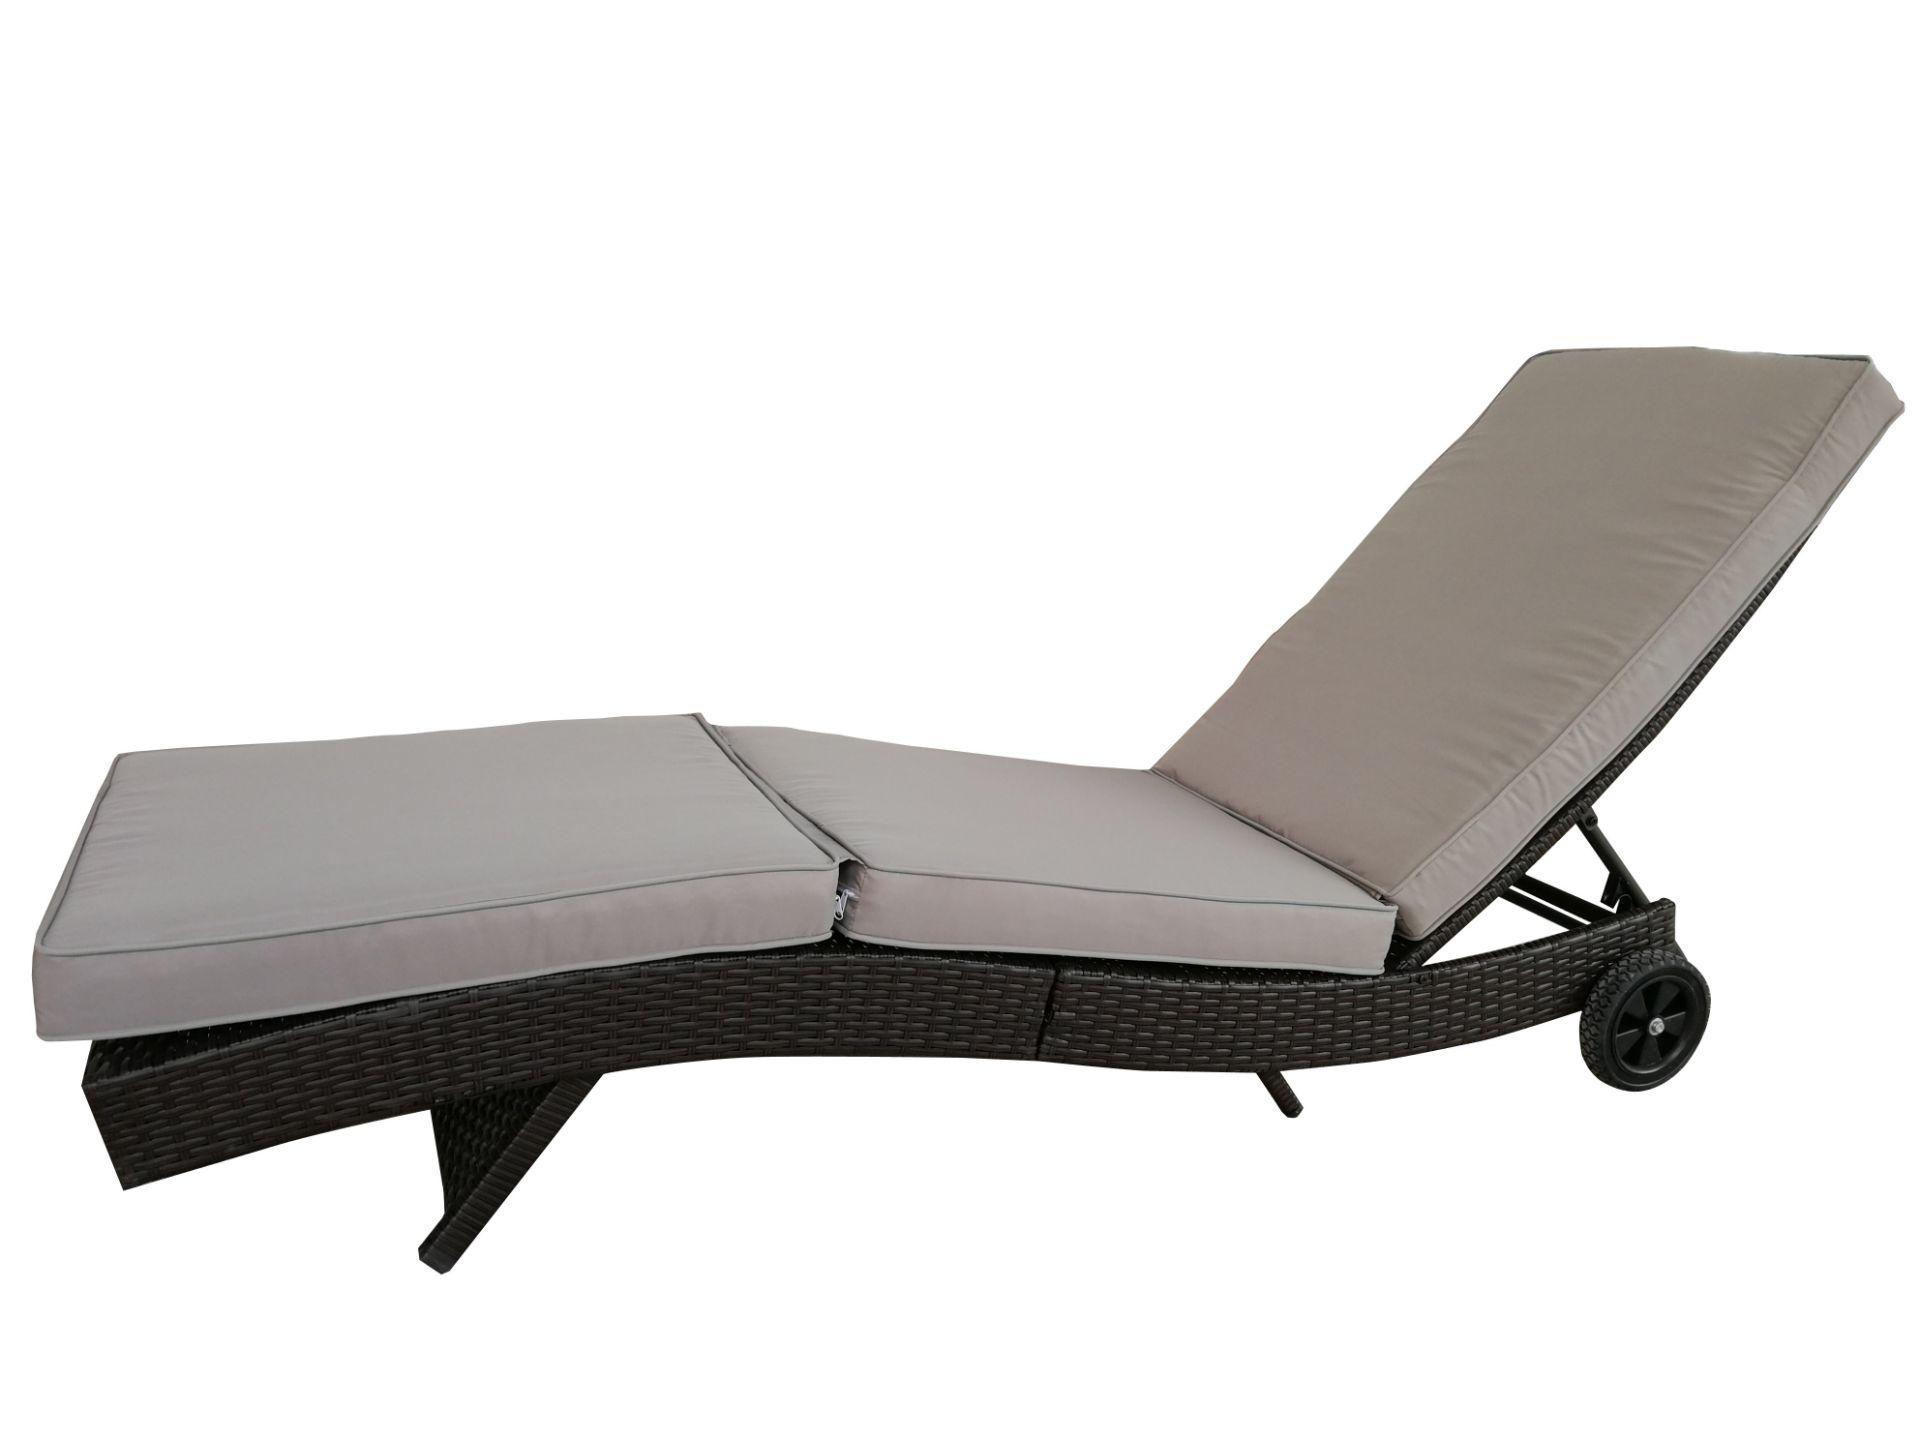 + VAT Brand New Chelsea Garden Company Dark Brown Rattan Sunbed - Steel Framed - Include Cushion - - Image 4 of 5